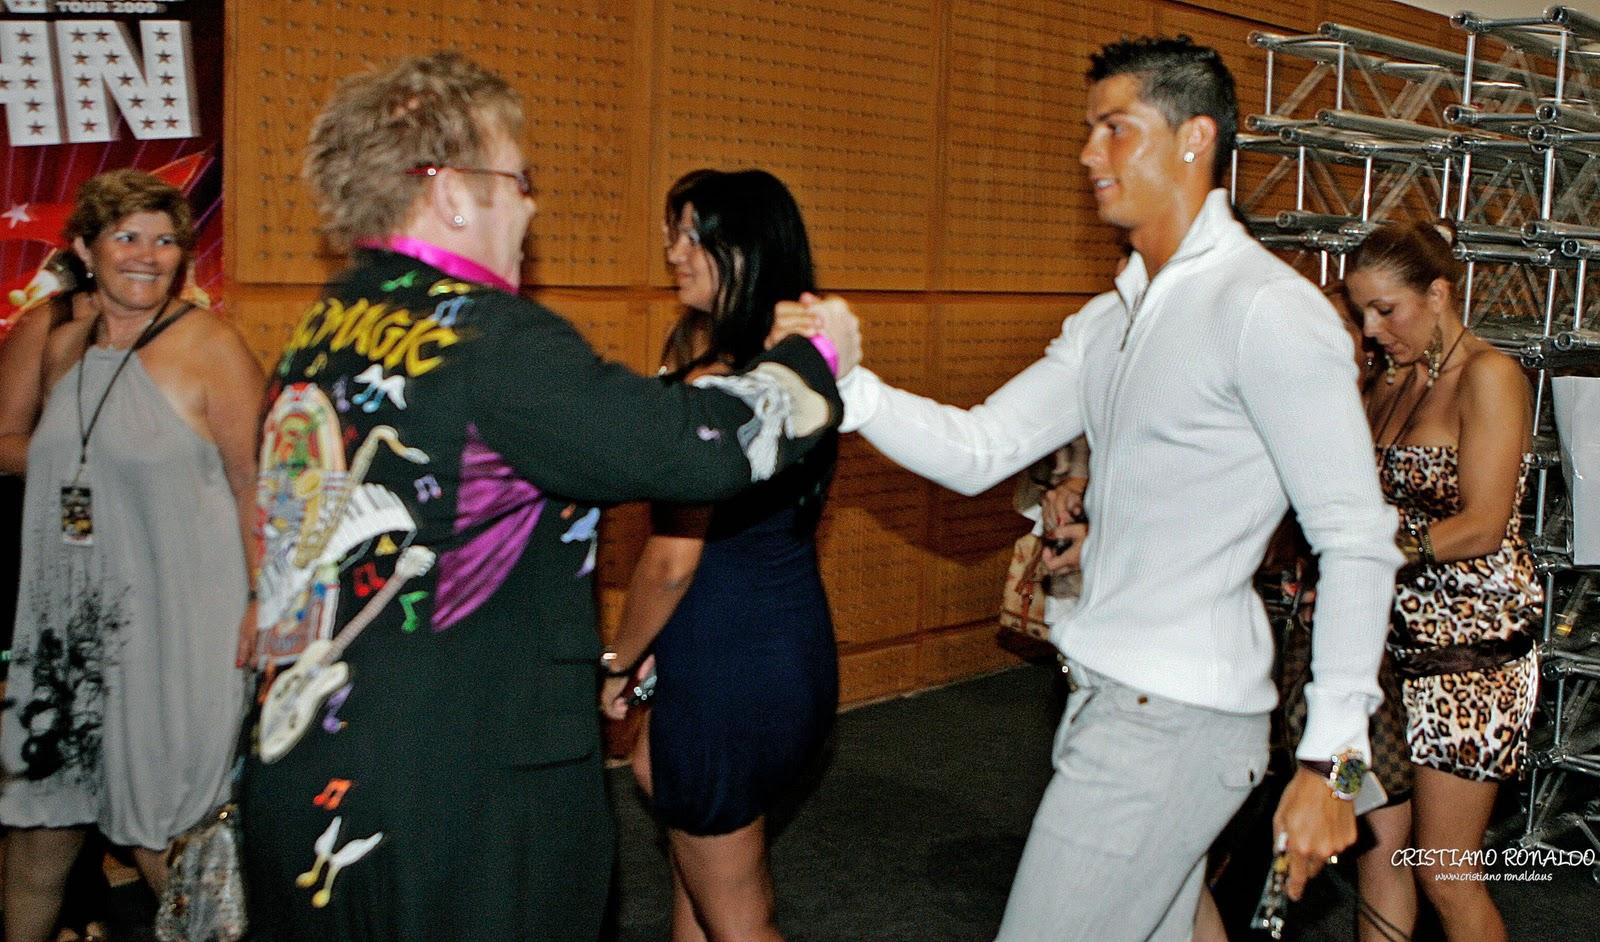 elton john´s pics: Elton John and Cristiano Ronaldo